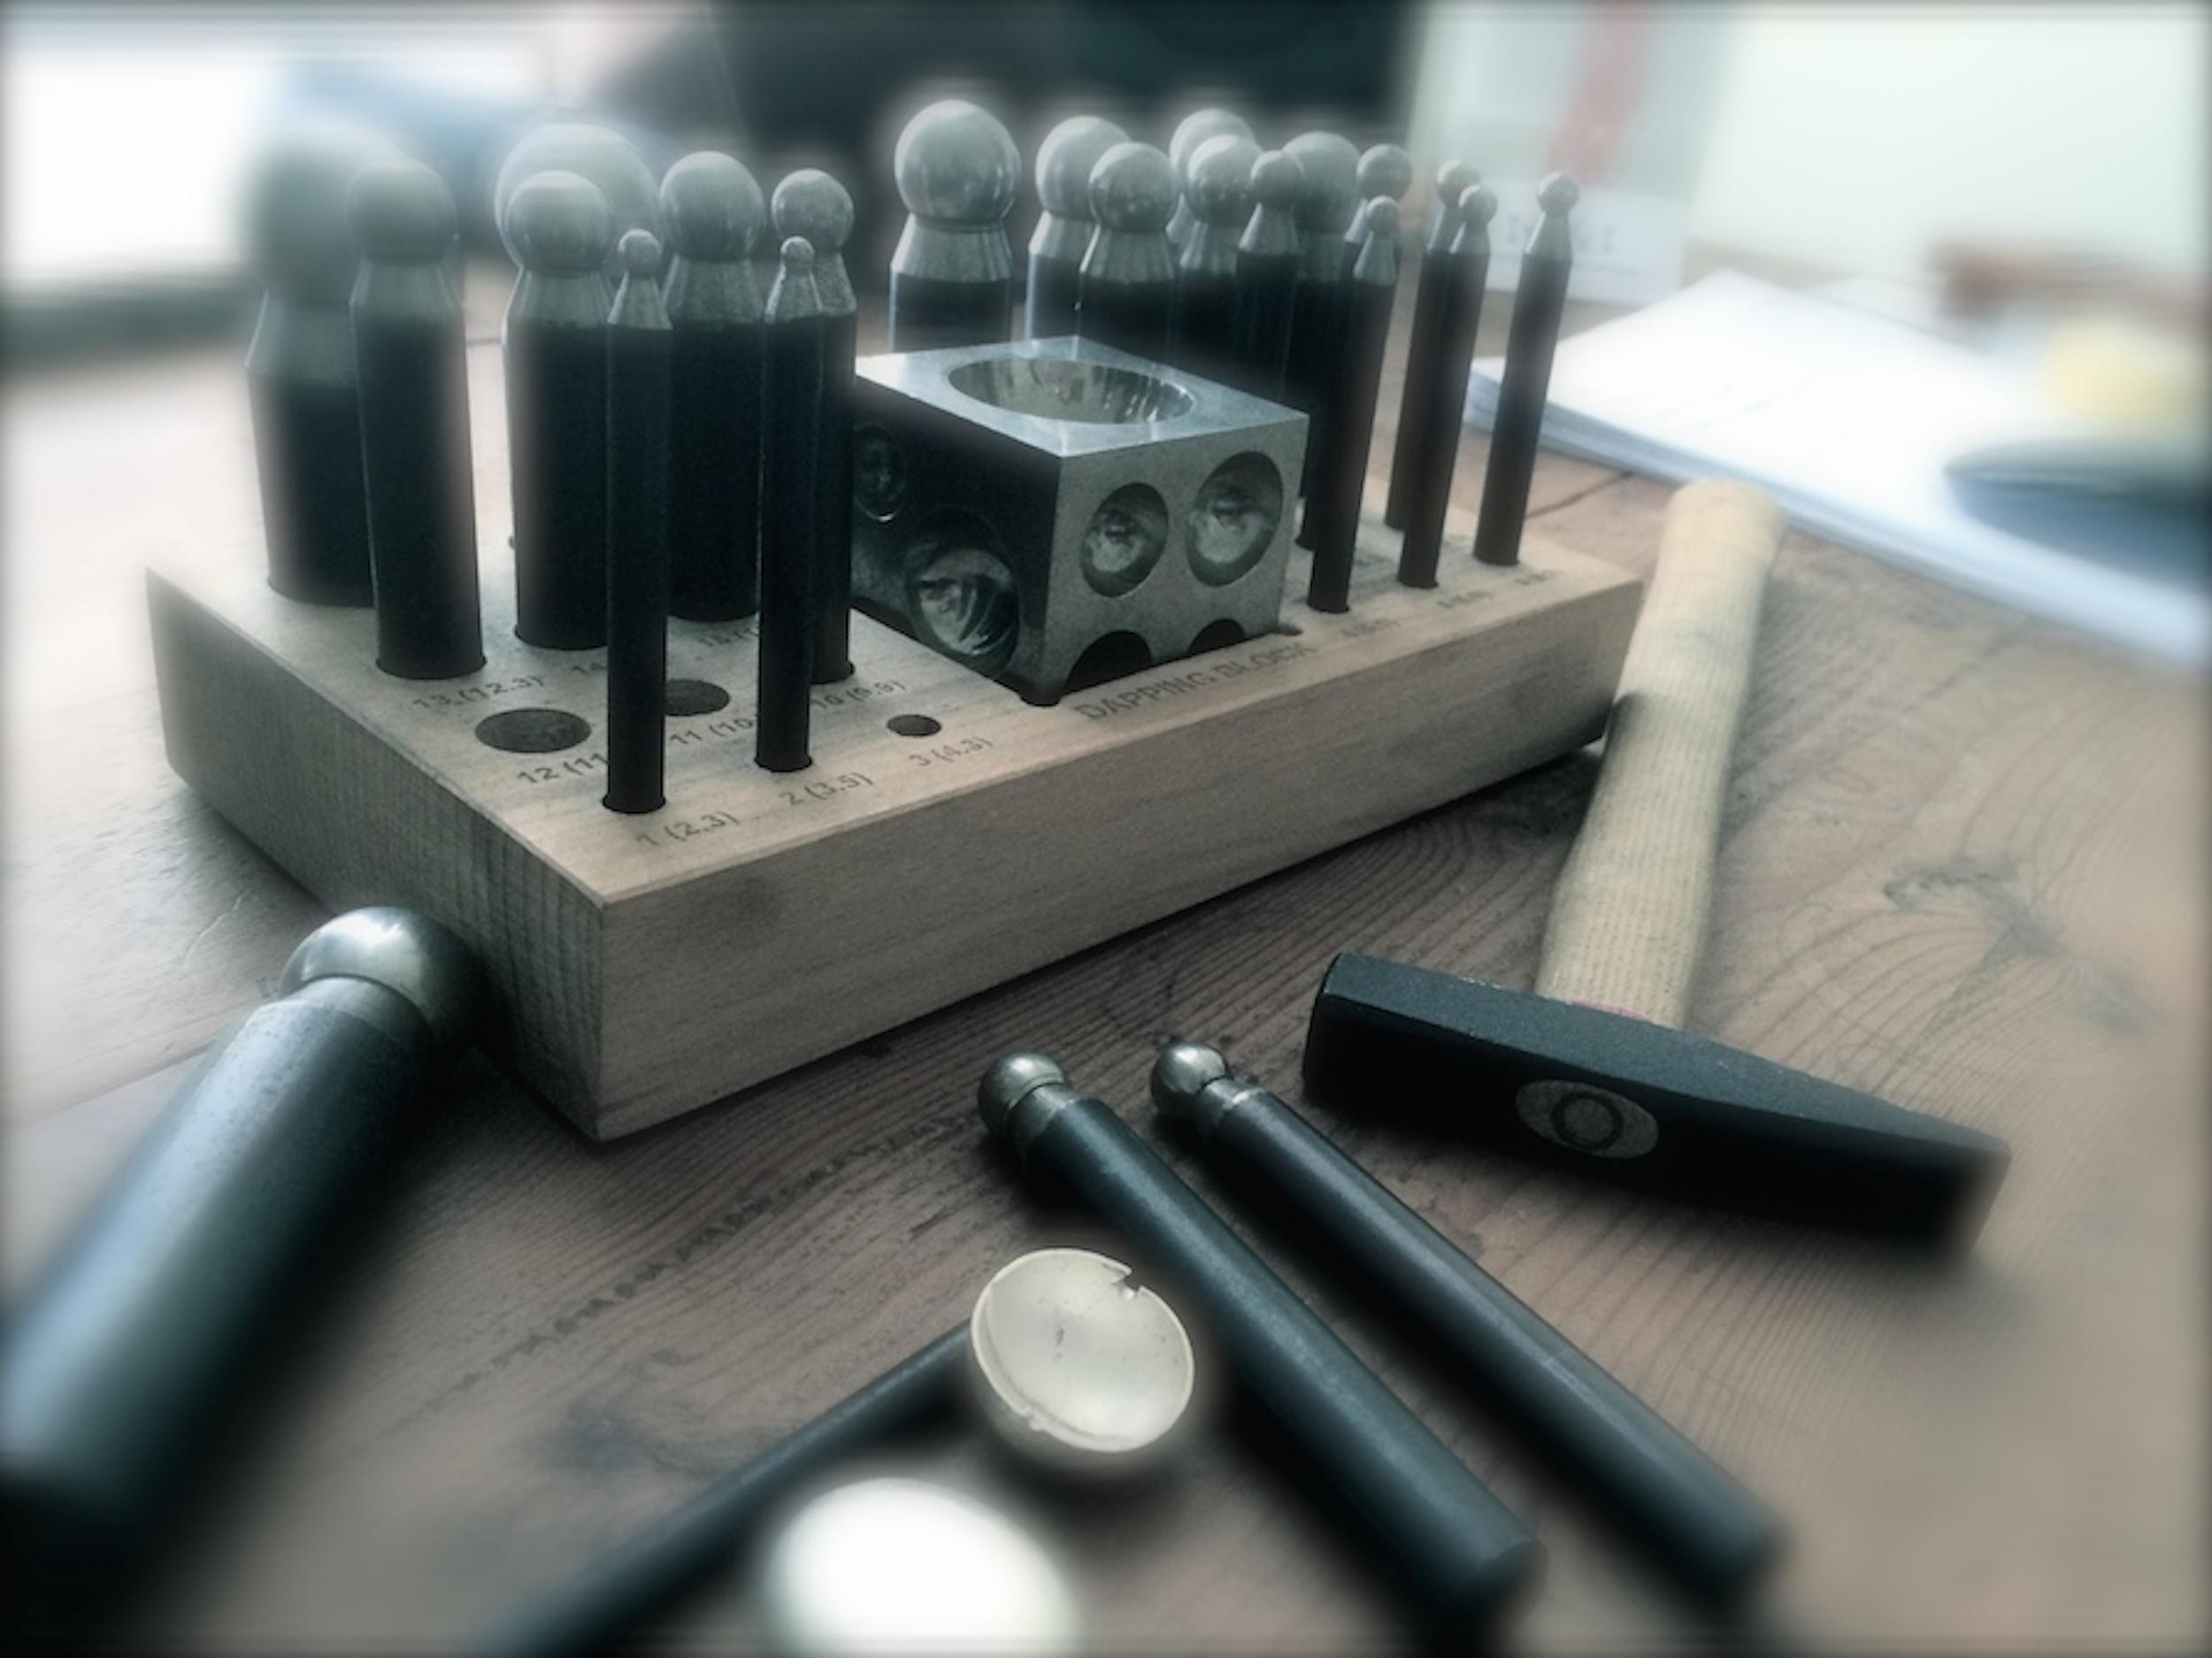 Bench tools 72dpi.JPG